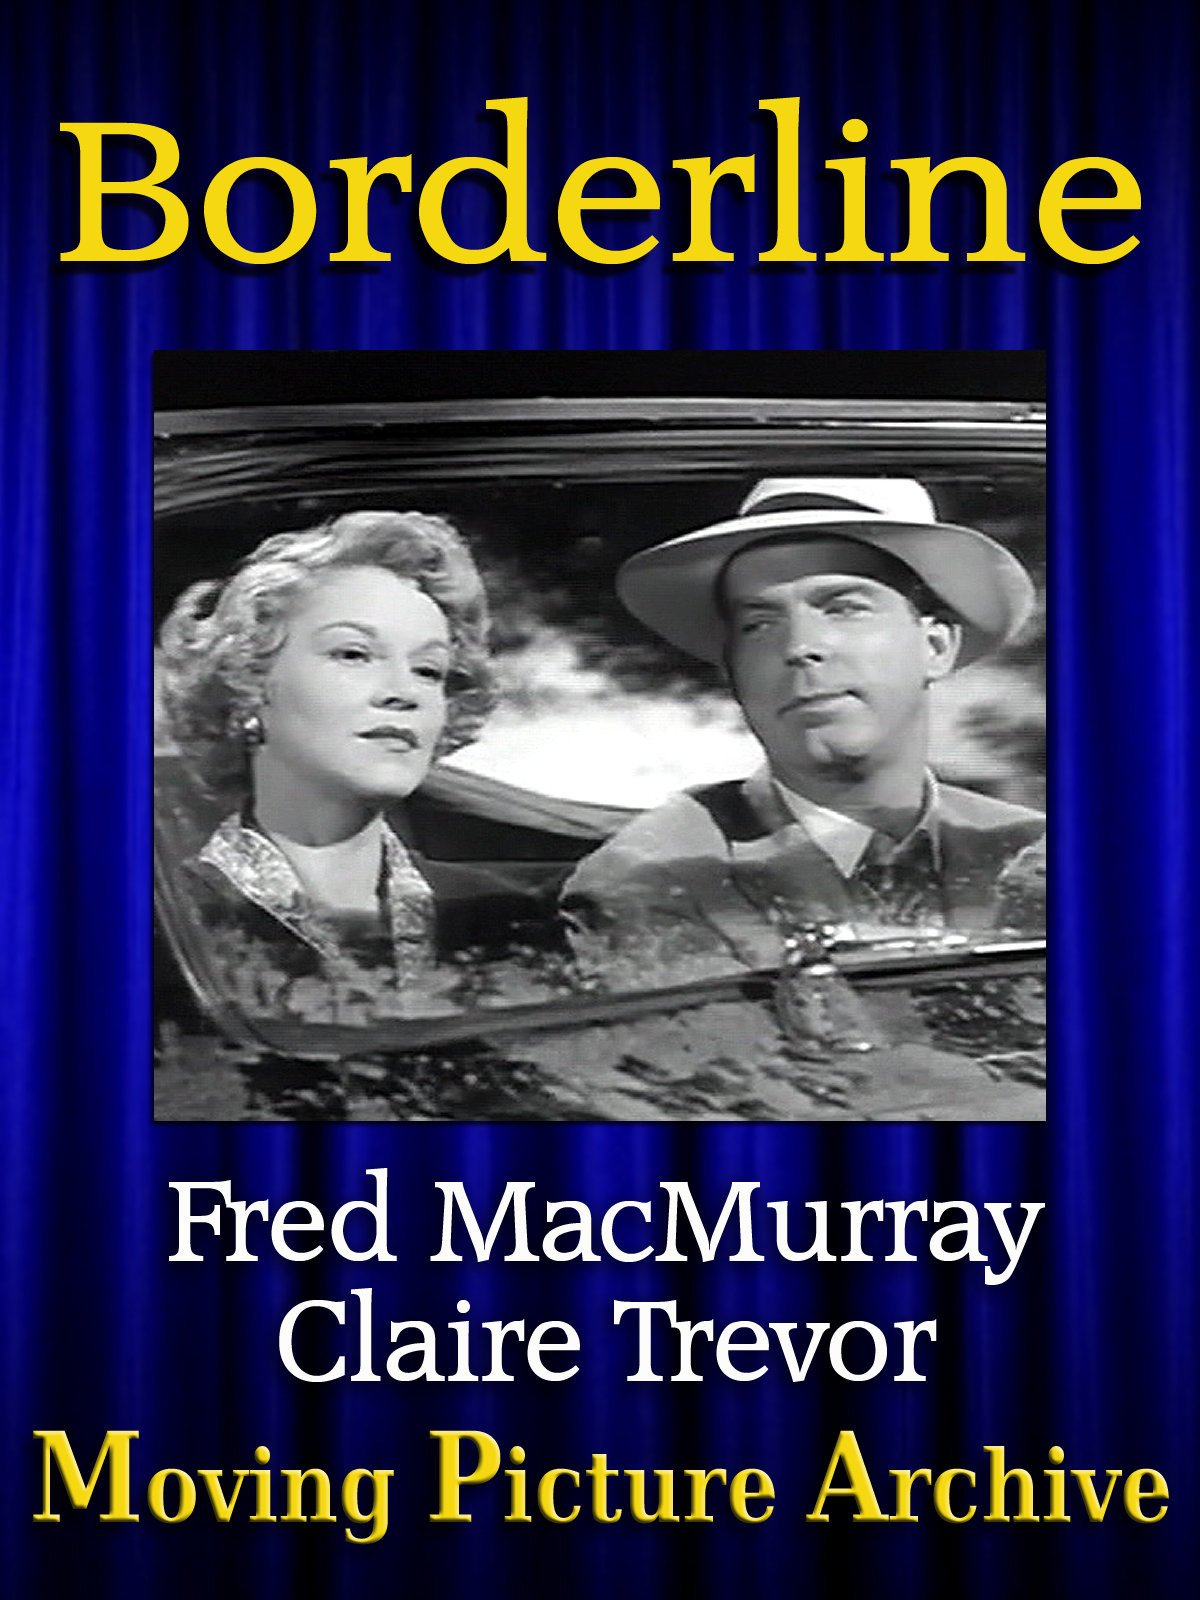 Borderline - 1950